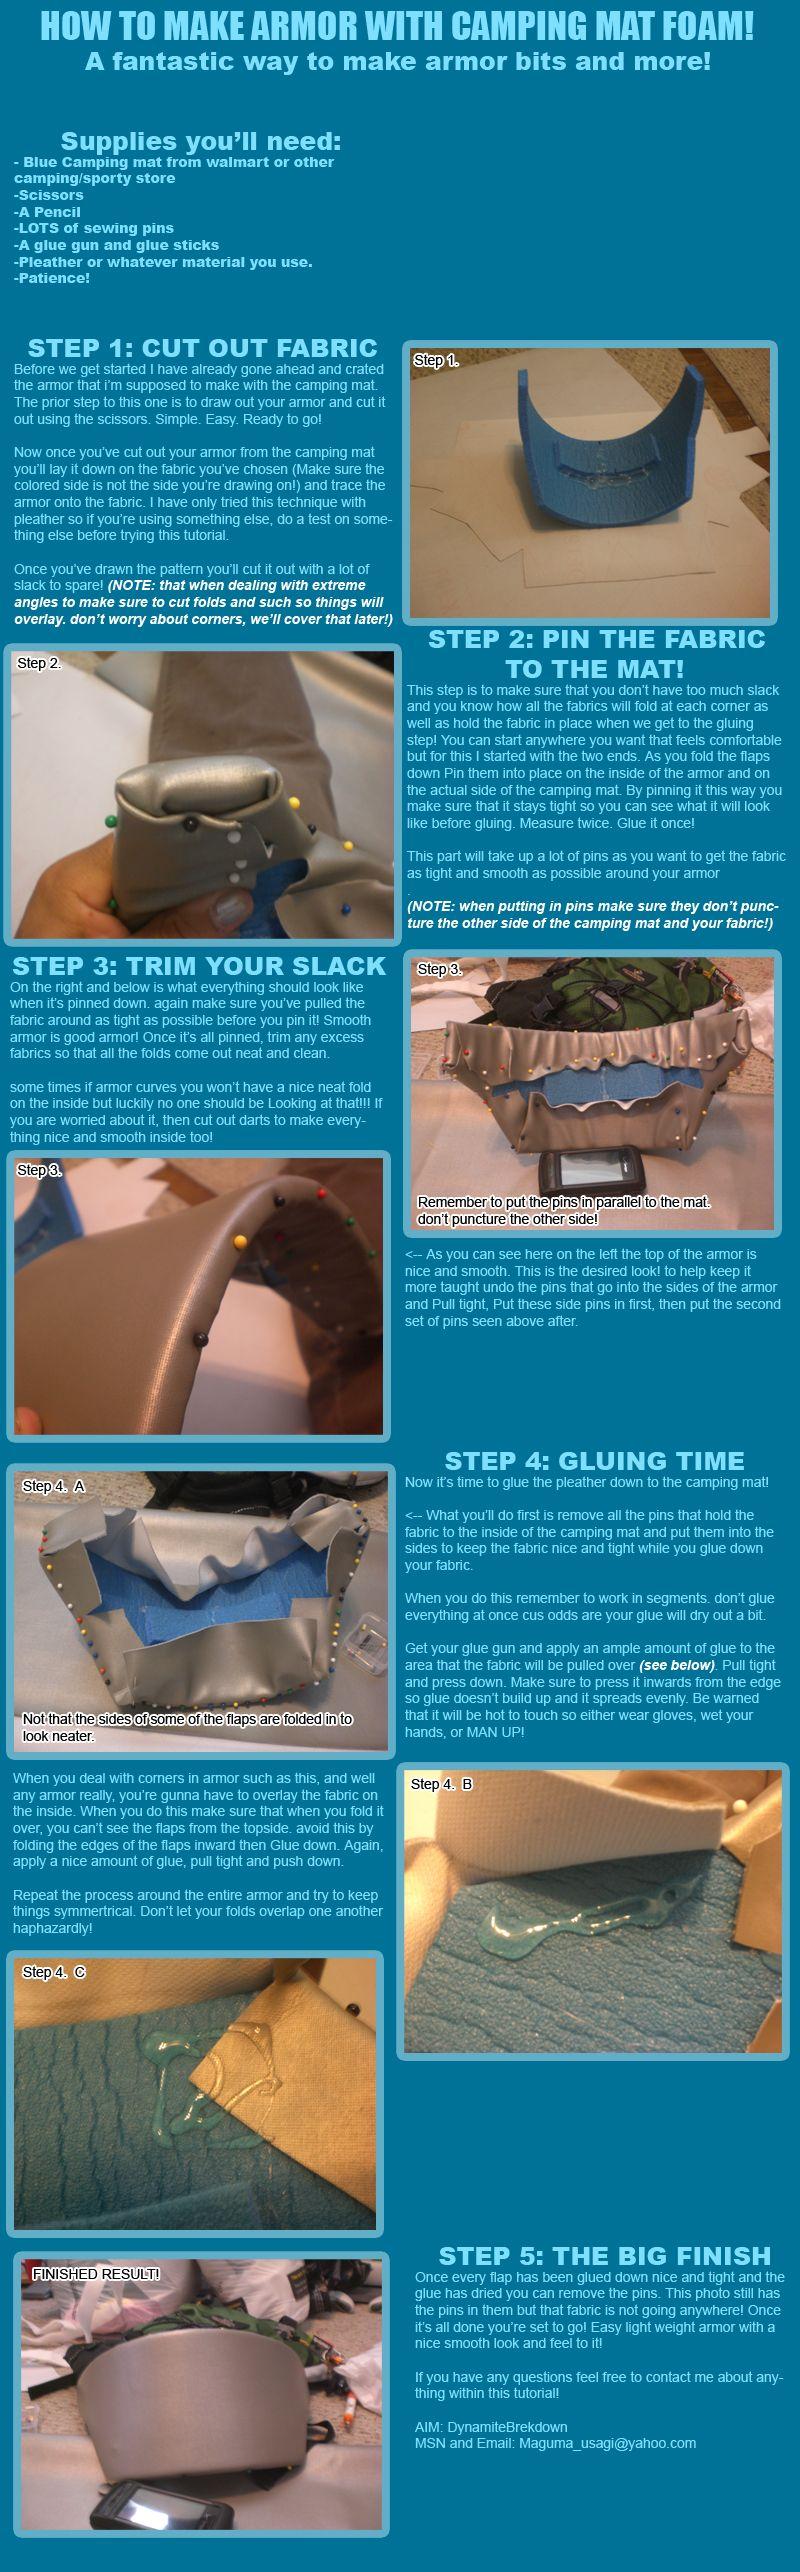 How to make armor by Maguma by DynamiteBreakdown deviantart